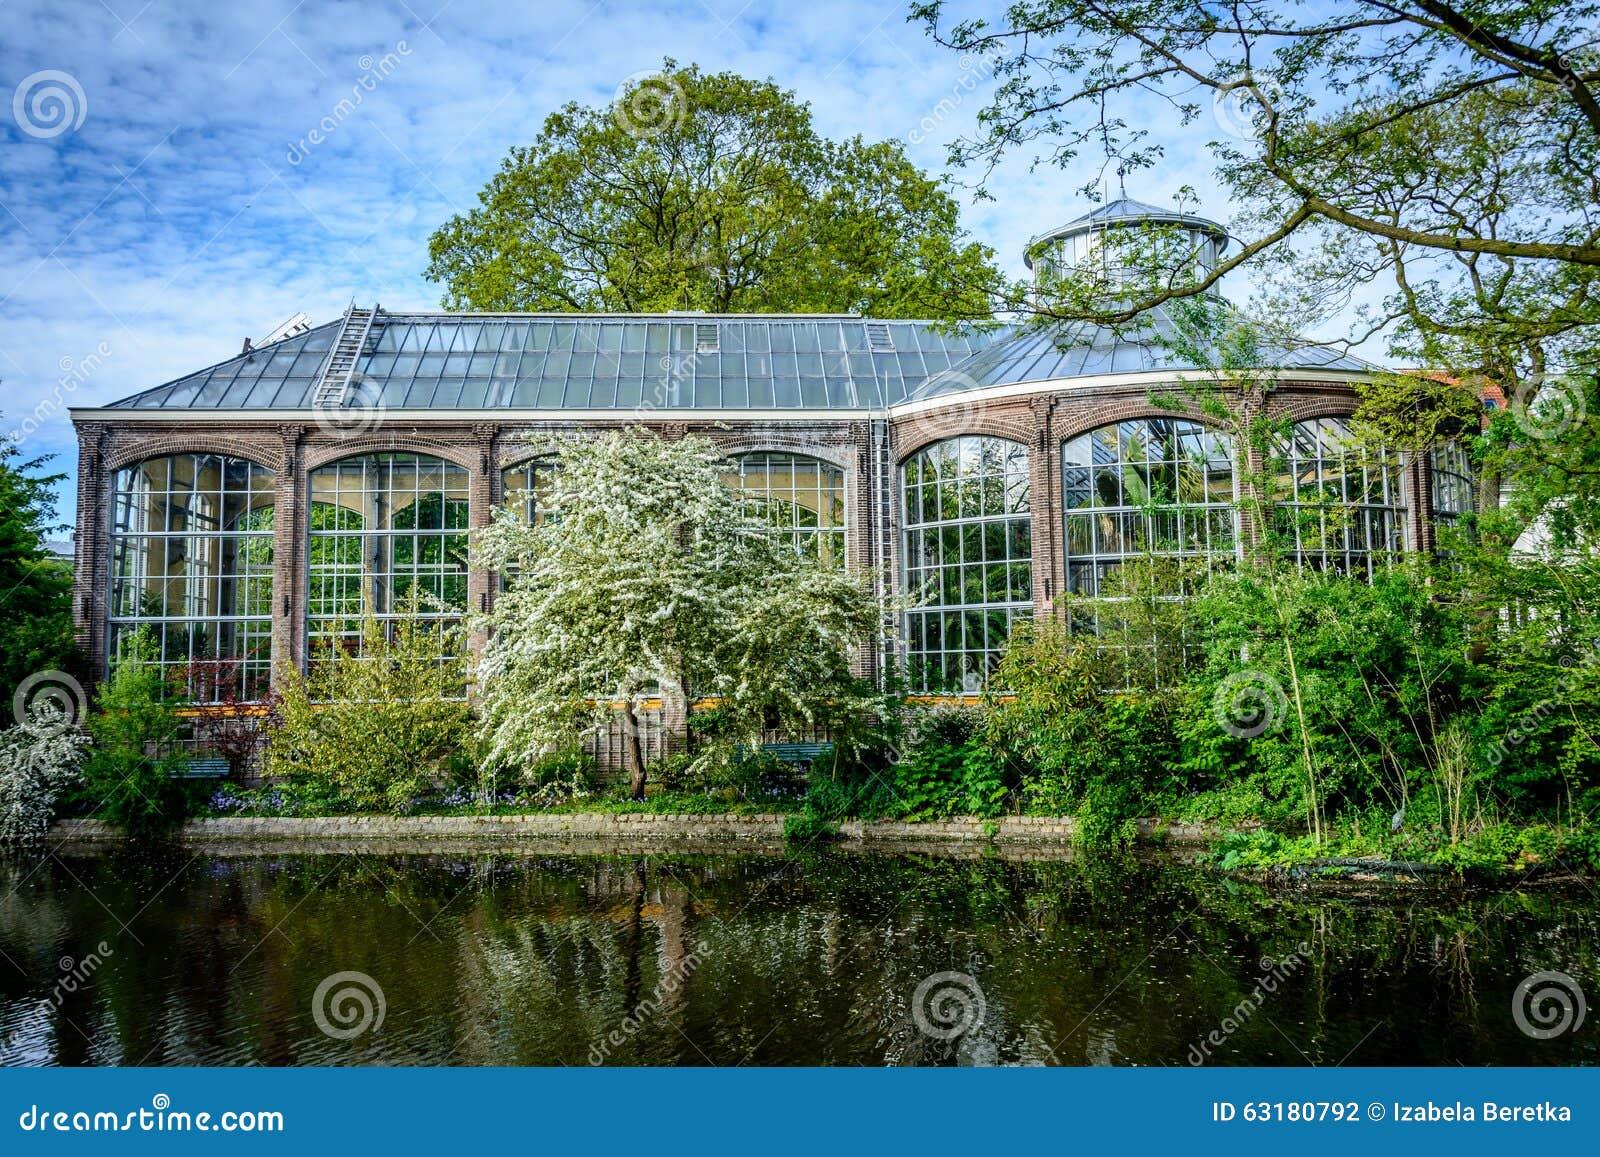 Hortus botanicus amsterdam stock photo image of netherland amsterdam 63180792 for What time does the botanical gardens close